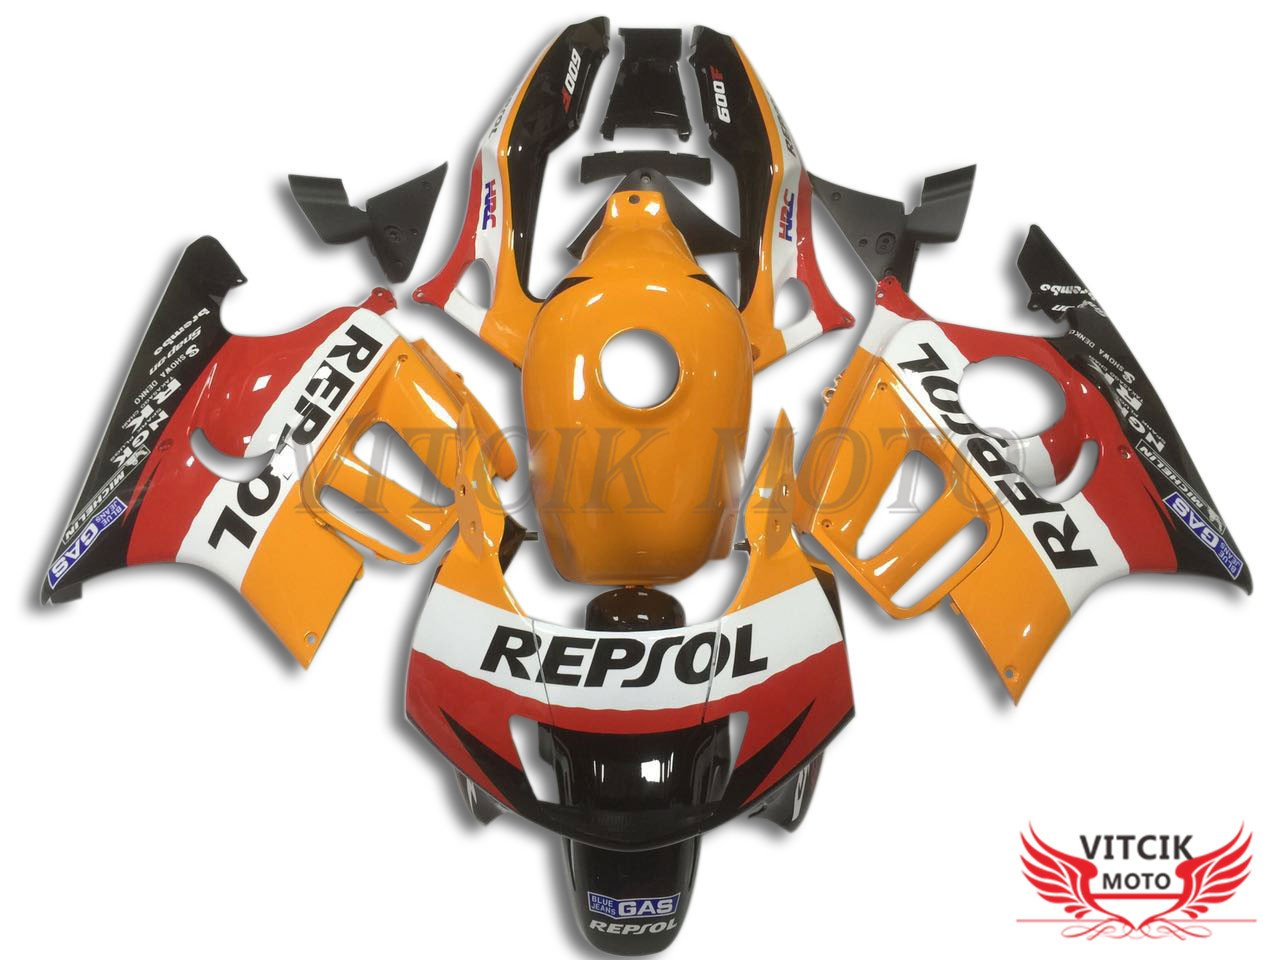 VITCIK (フェアリングキット 対応車種 ホンダ Honda CBR600F3 CBR600F 1997 1998 CBR 600 F3 97 98) プラスチックABS射出成型 完全なオートバイ車体 アフターマーケット車体フレーム 外装パーツセット(オレンジ色 & ブラック) A024   B074W8K6BC